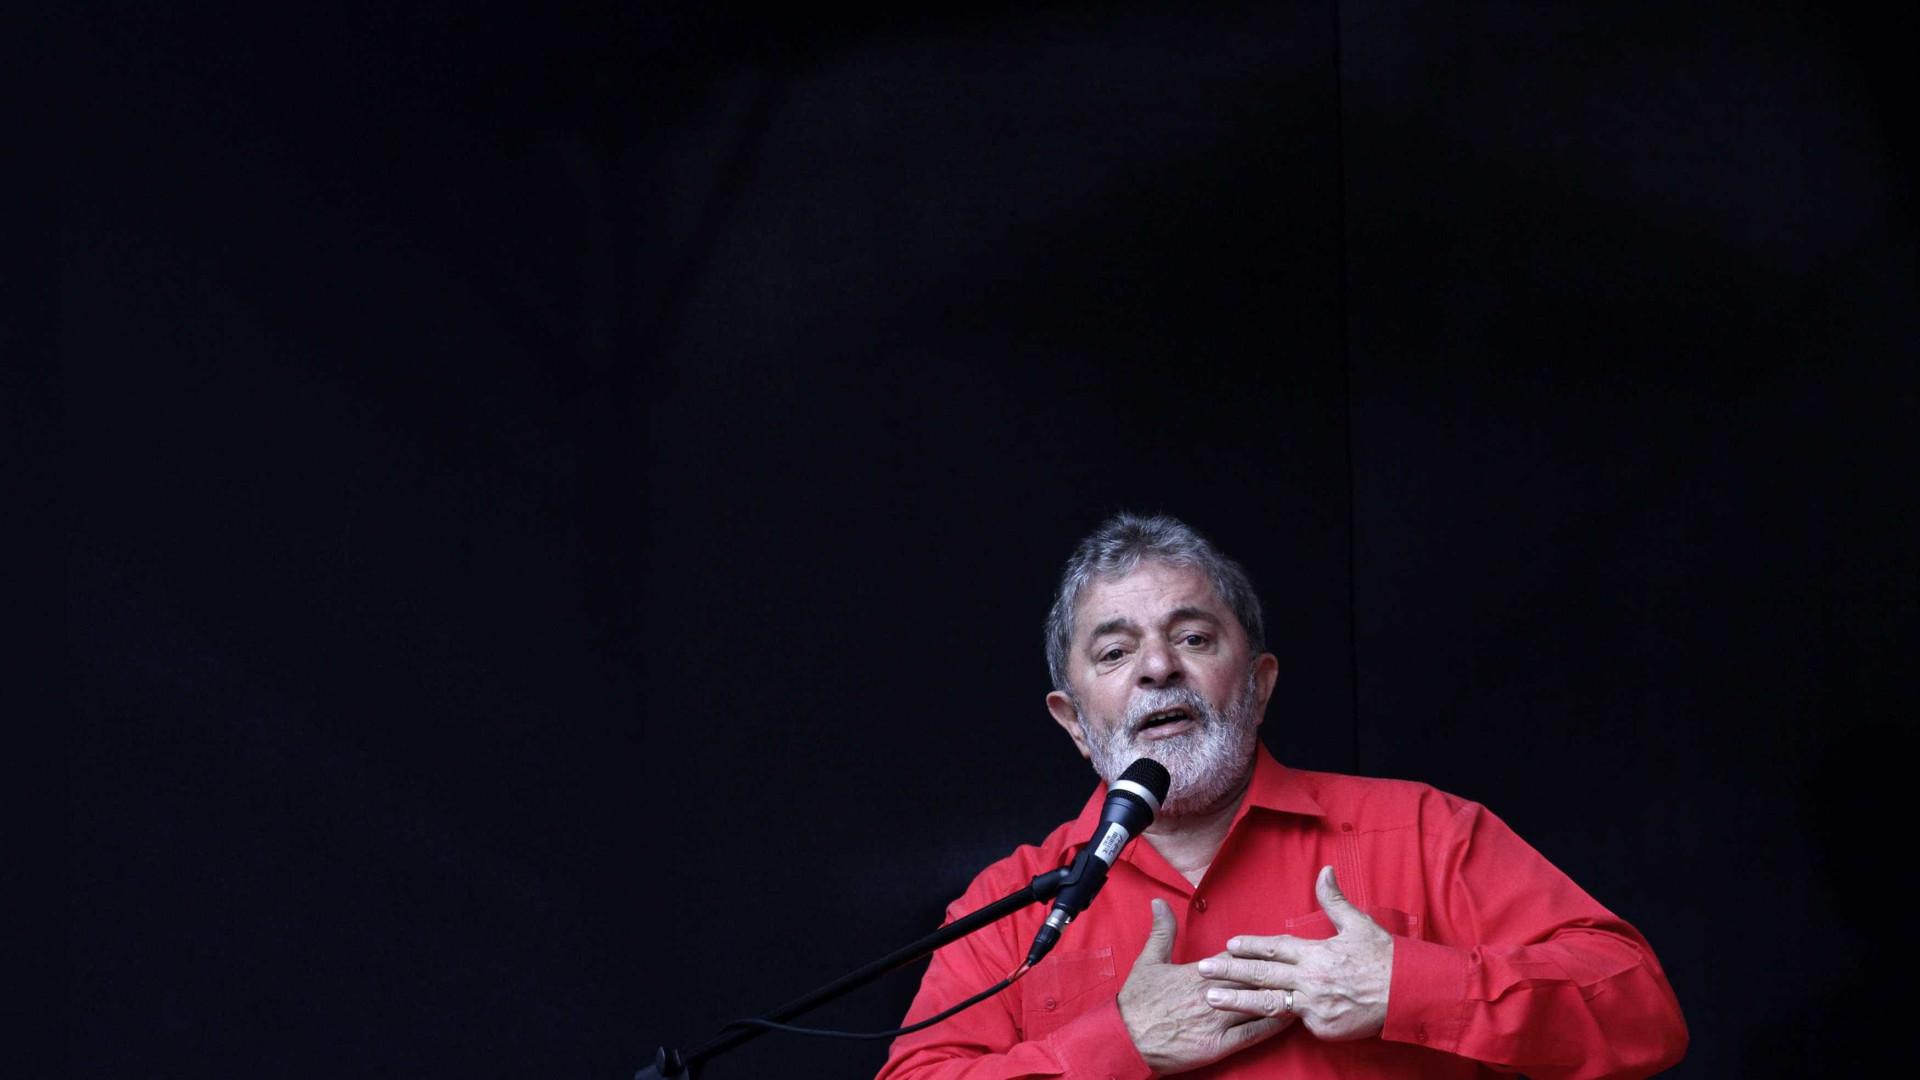 'É maluquice', diz Lula sobre renúncia de Haddad para Ciro concorrer